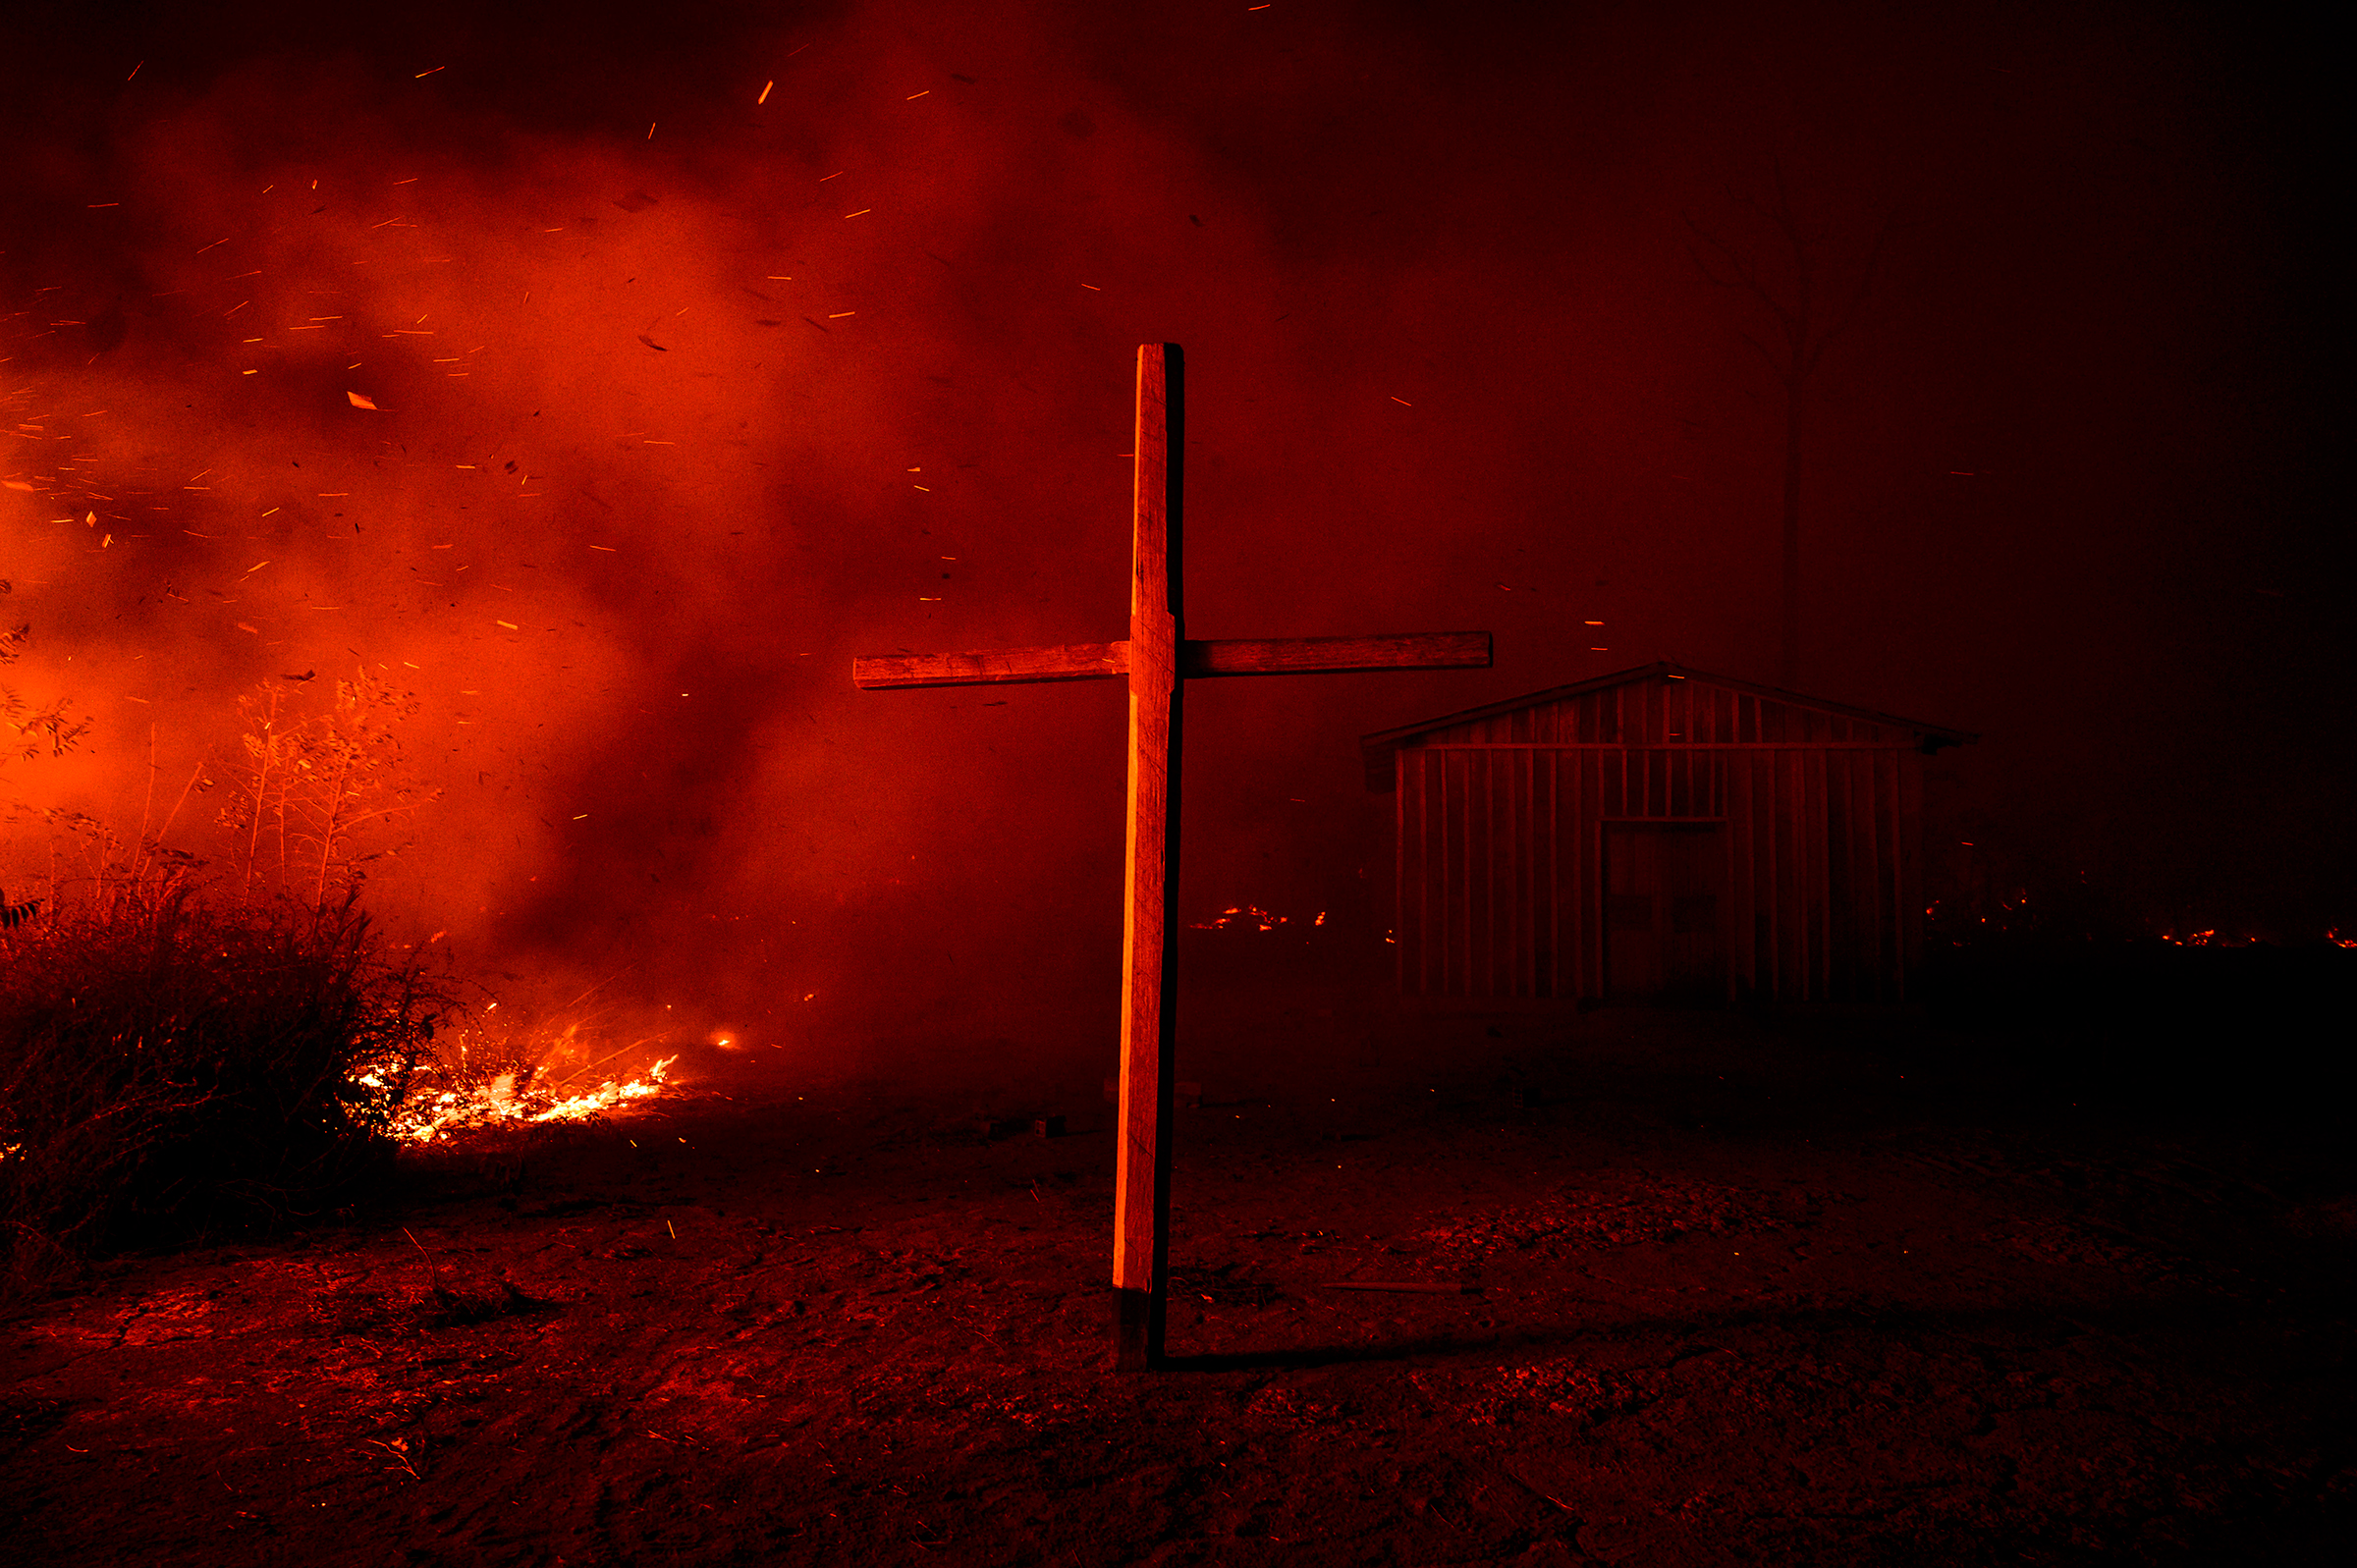 A church is enveloped in smoke from nearby flames in the region of Vila Nova Samuel on Aug. 27.